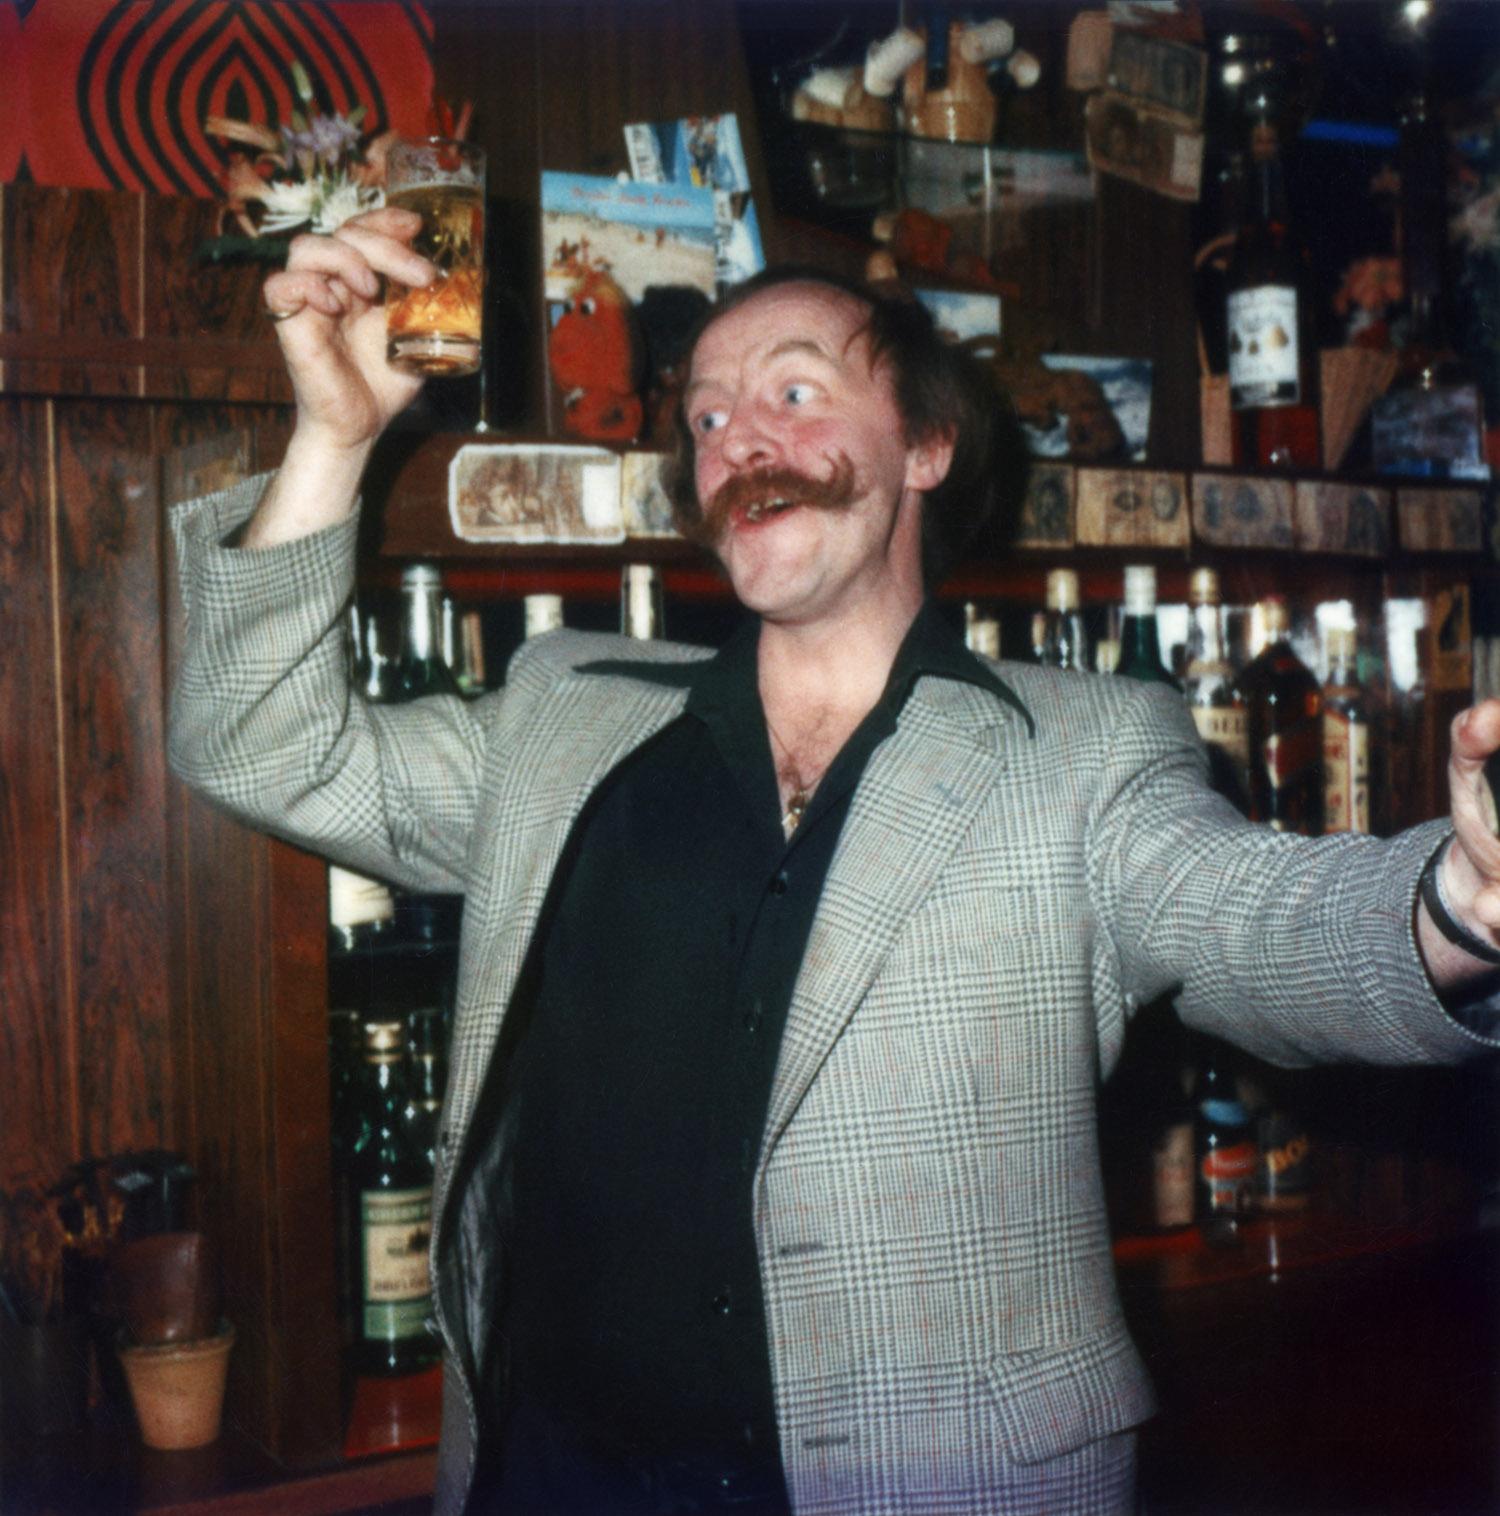 Bar owner Henk